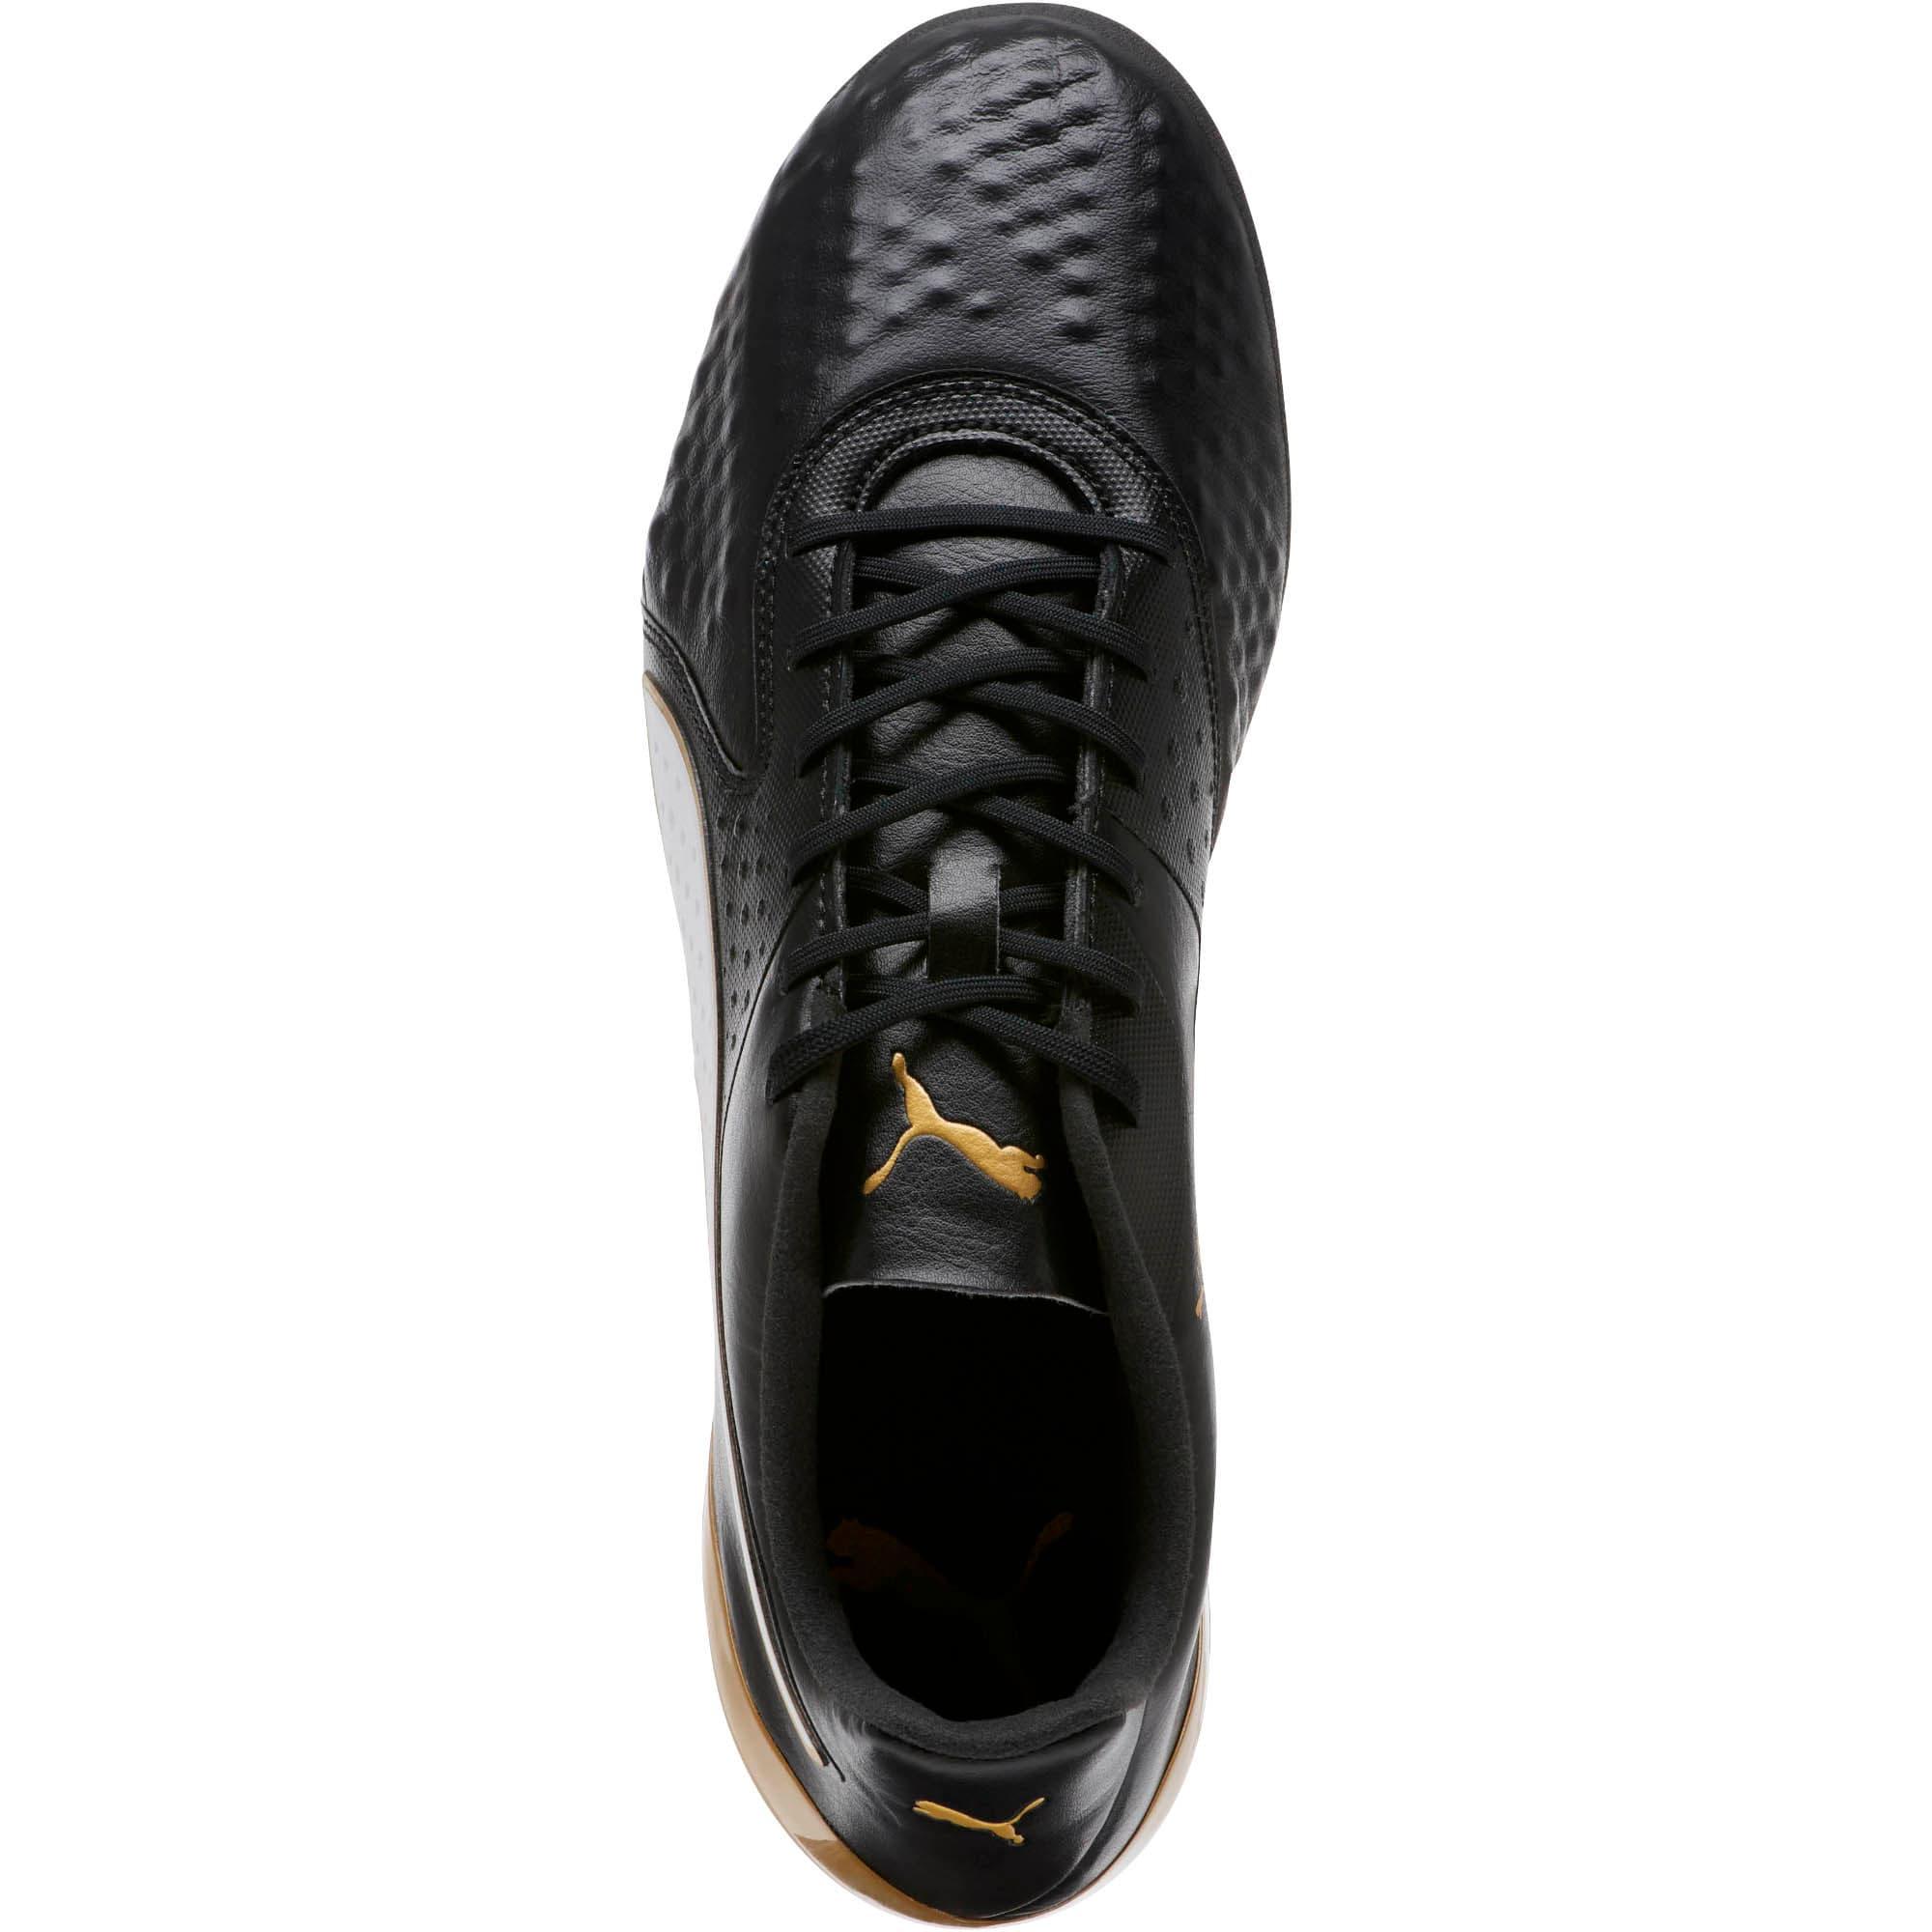 Thumbnail 5 of PUMA ONE 19.1 FG/AG Soccer Cleats, Black-White-Gold, medium